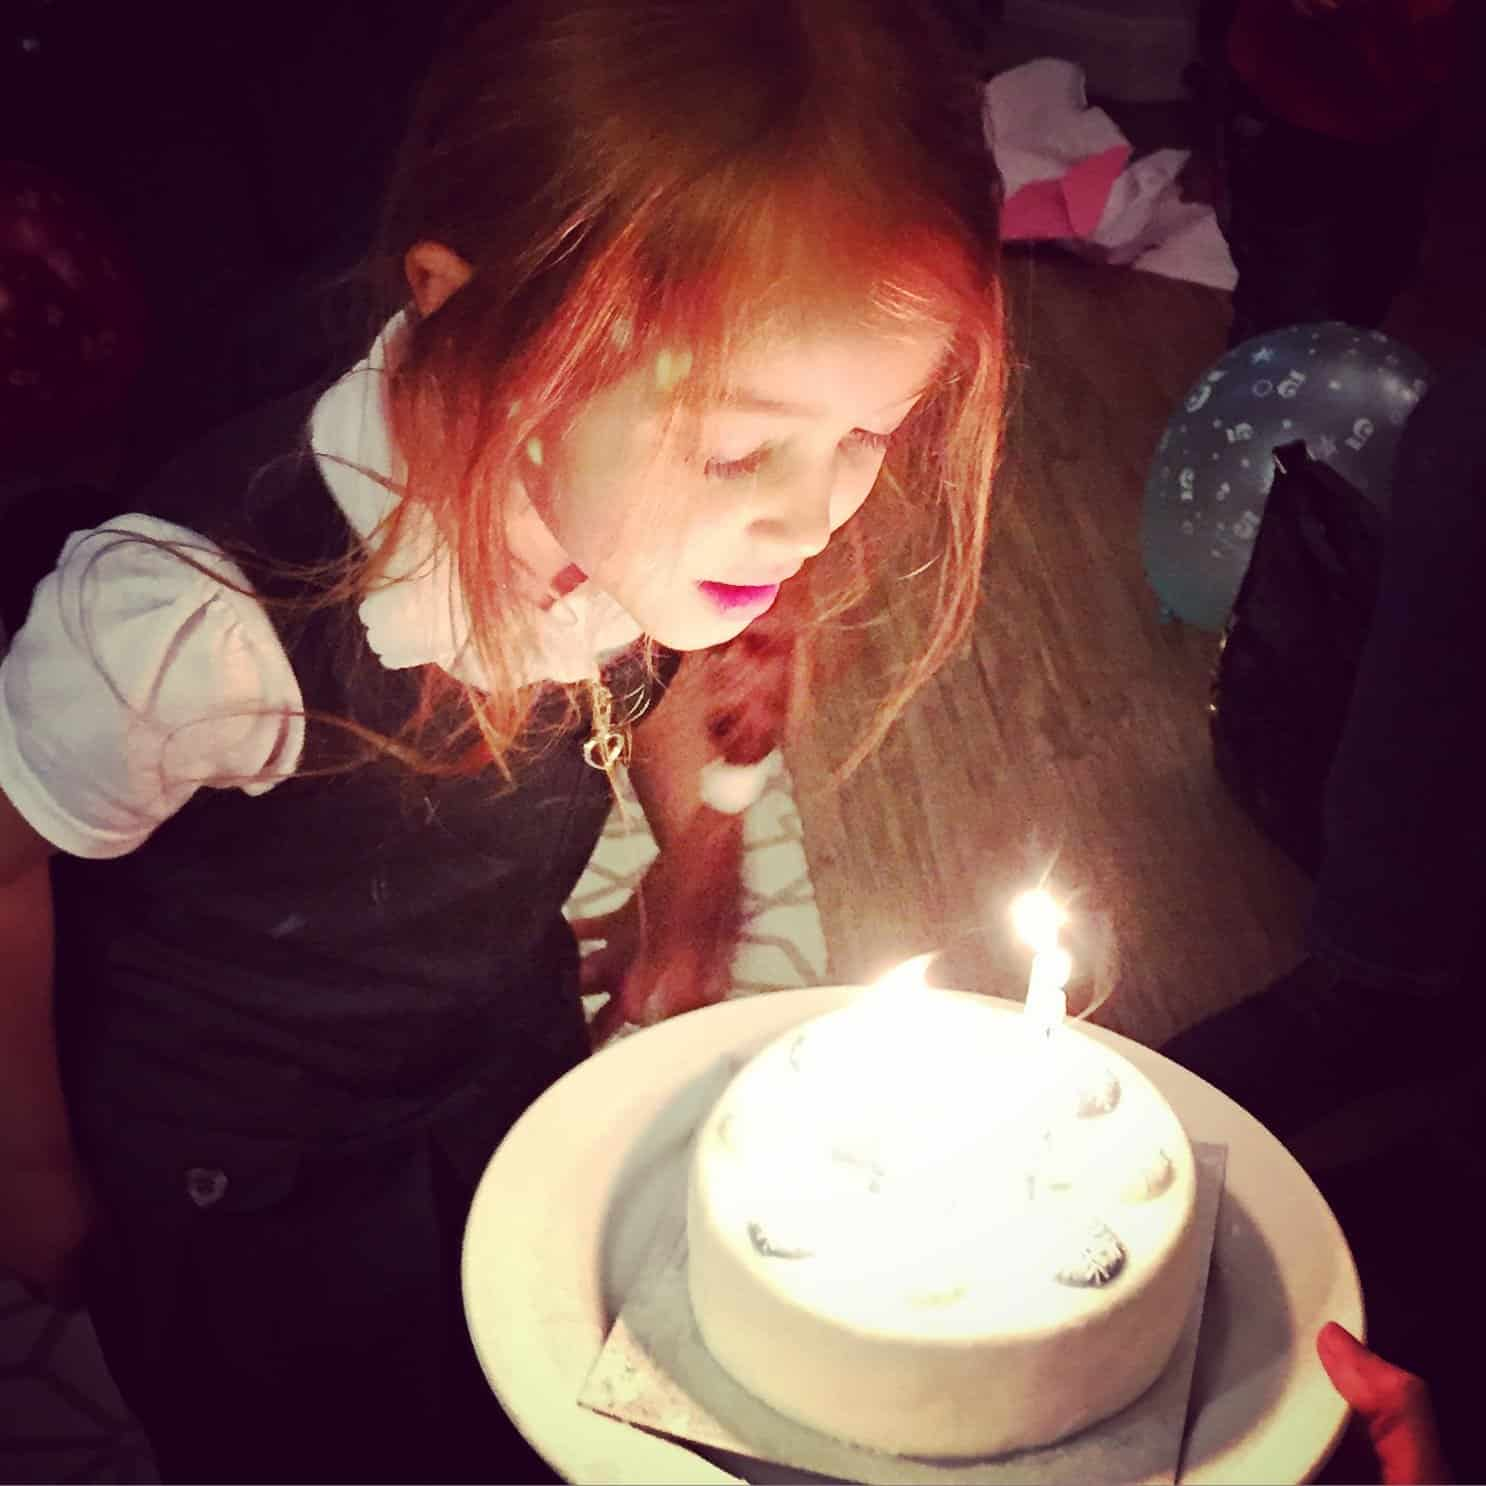 Ava on her fifth birthday